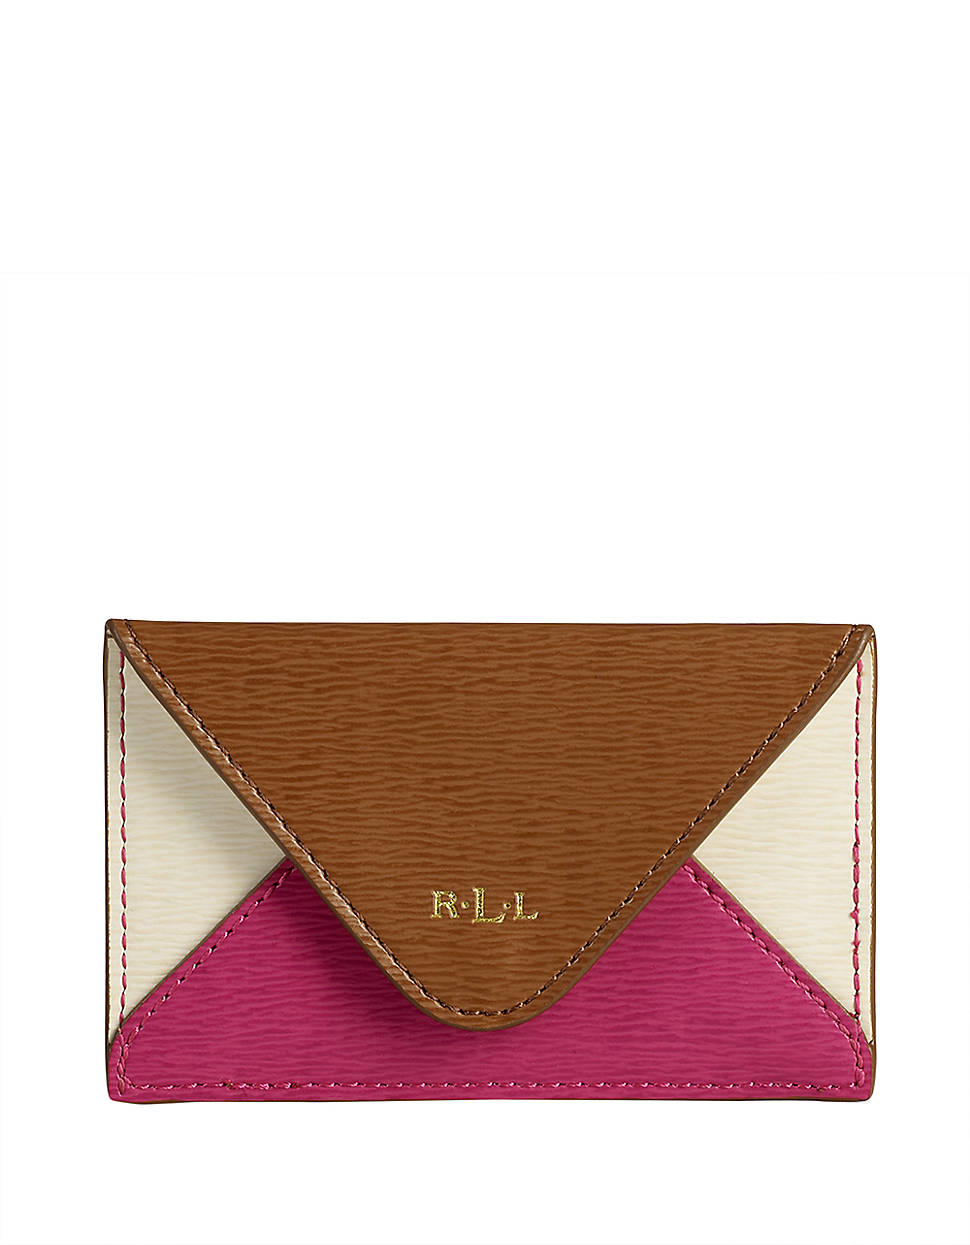 finest selection 314ee d9614 Lauren By Ralph Lauren Newbury Leather Colorblocked Envelope Card ...